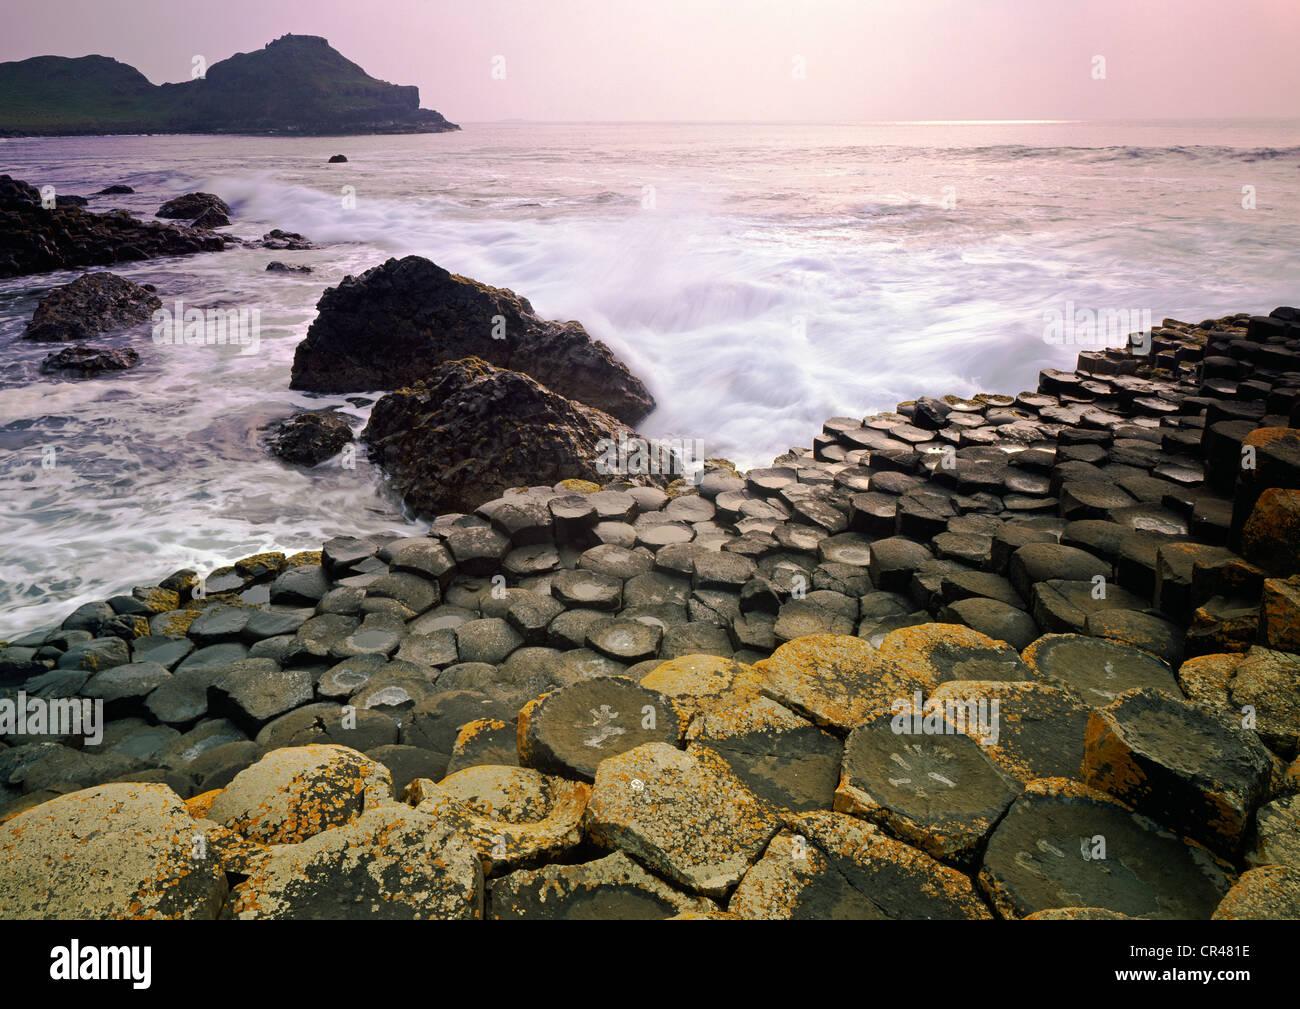 Giant's Causeway, County Antrim, Northern Ireland, United Kingdom, Europe - Stock Image